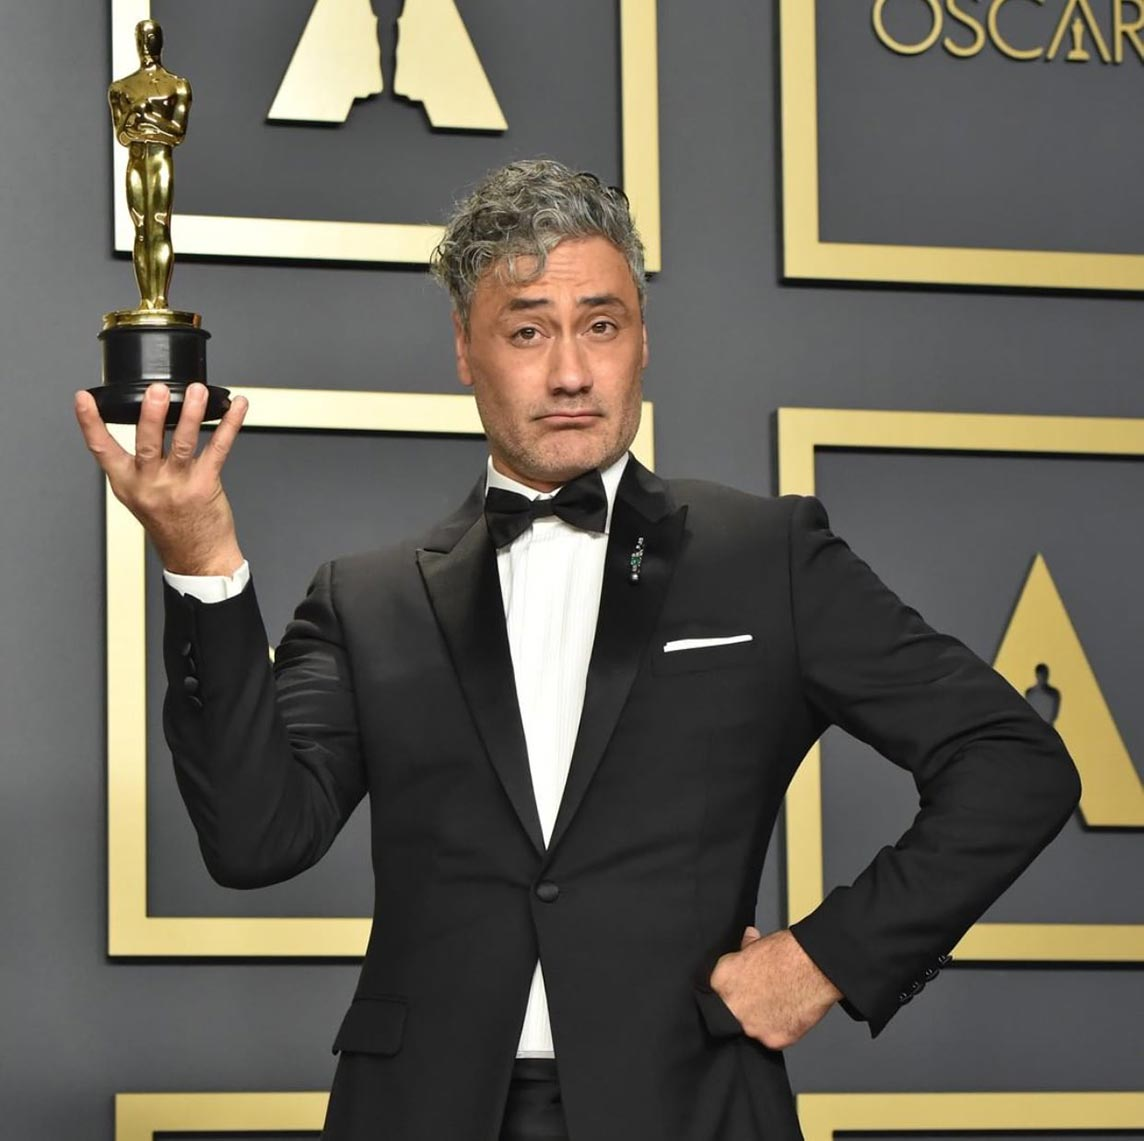 "Тайка Вайтити со статуэткой в руках, ""Оскар 2020"", фотография с режиссёром"